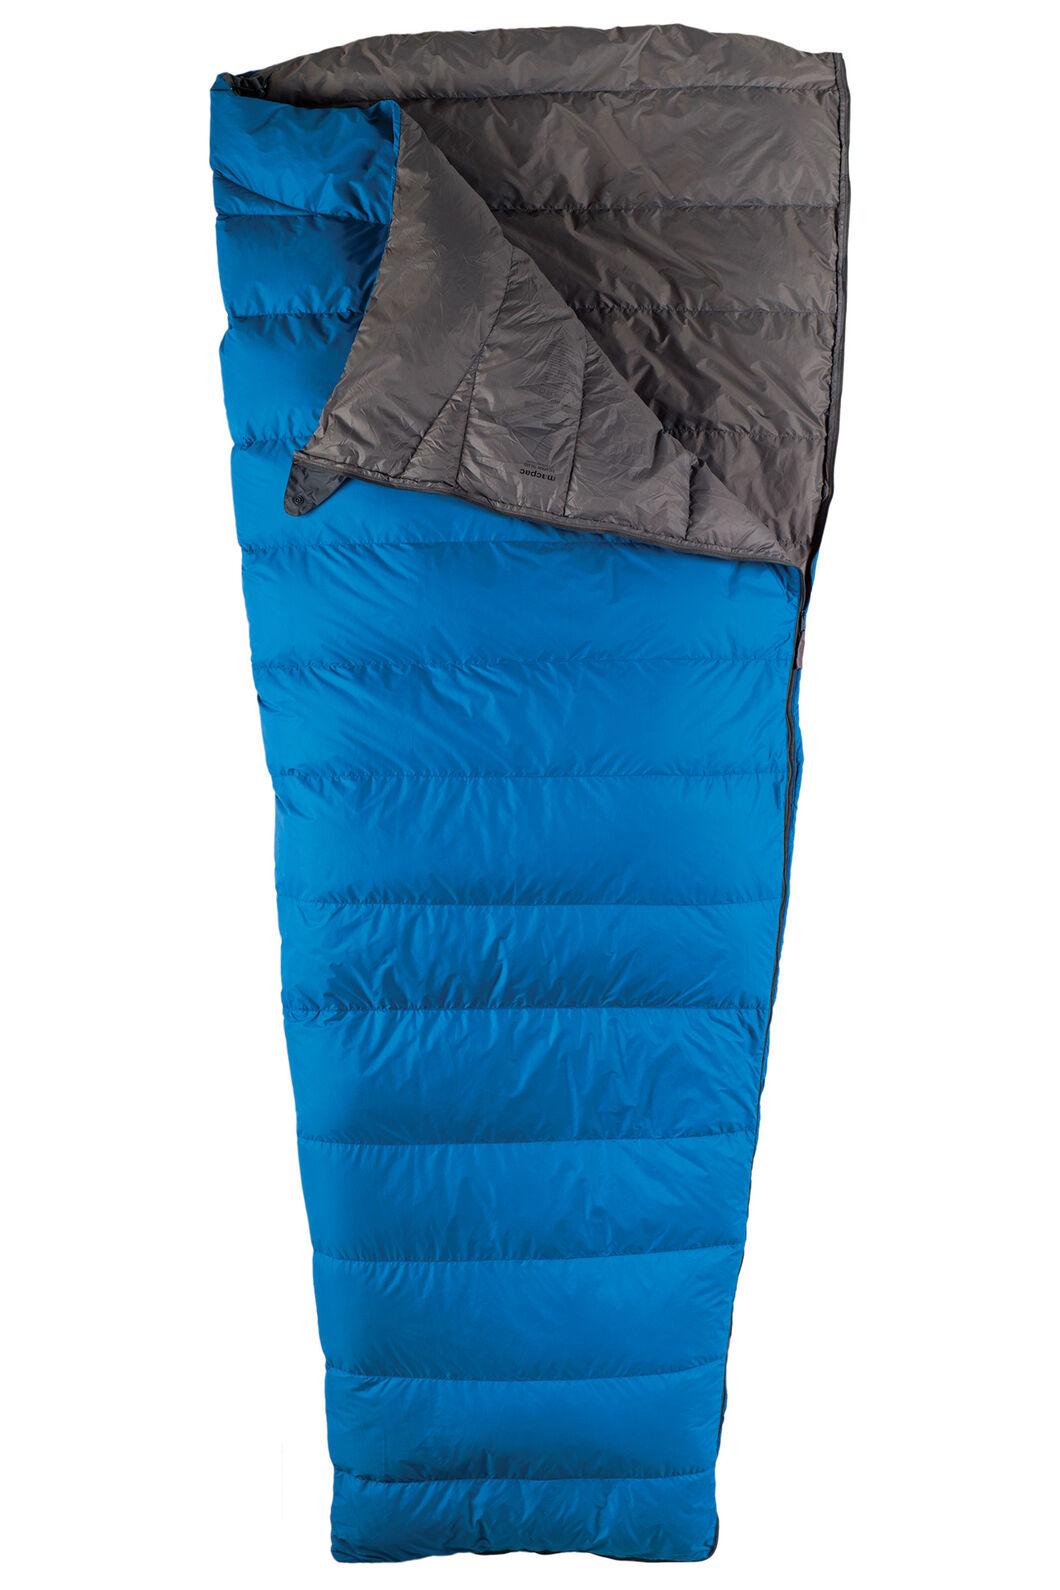 Macpac Escapade Down 150 Sleeping Bag - Standard, Classic Blue, hi-res